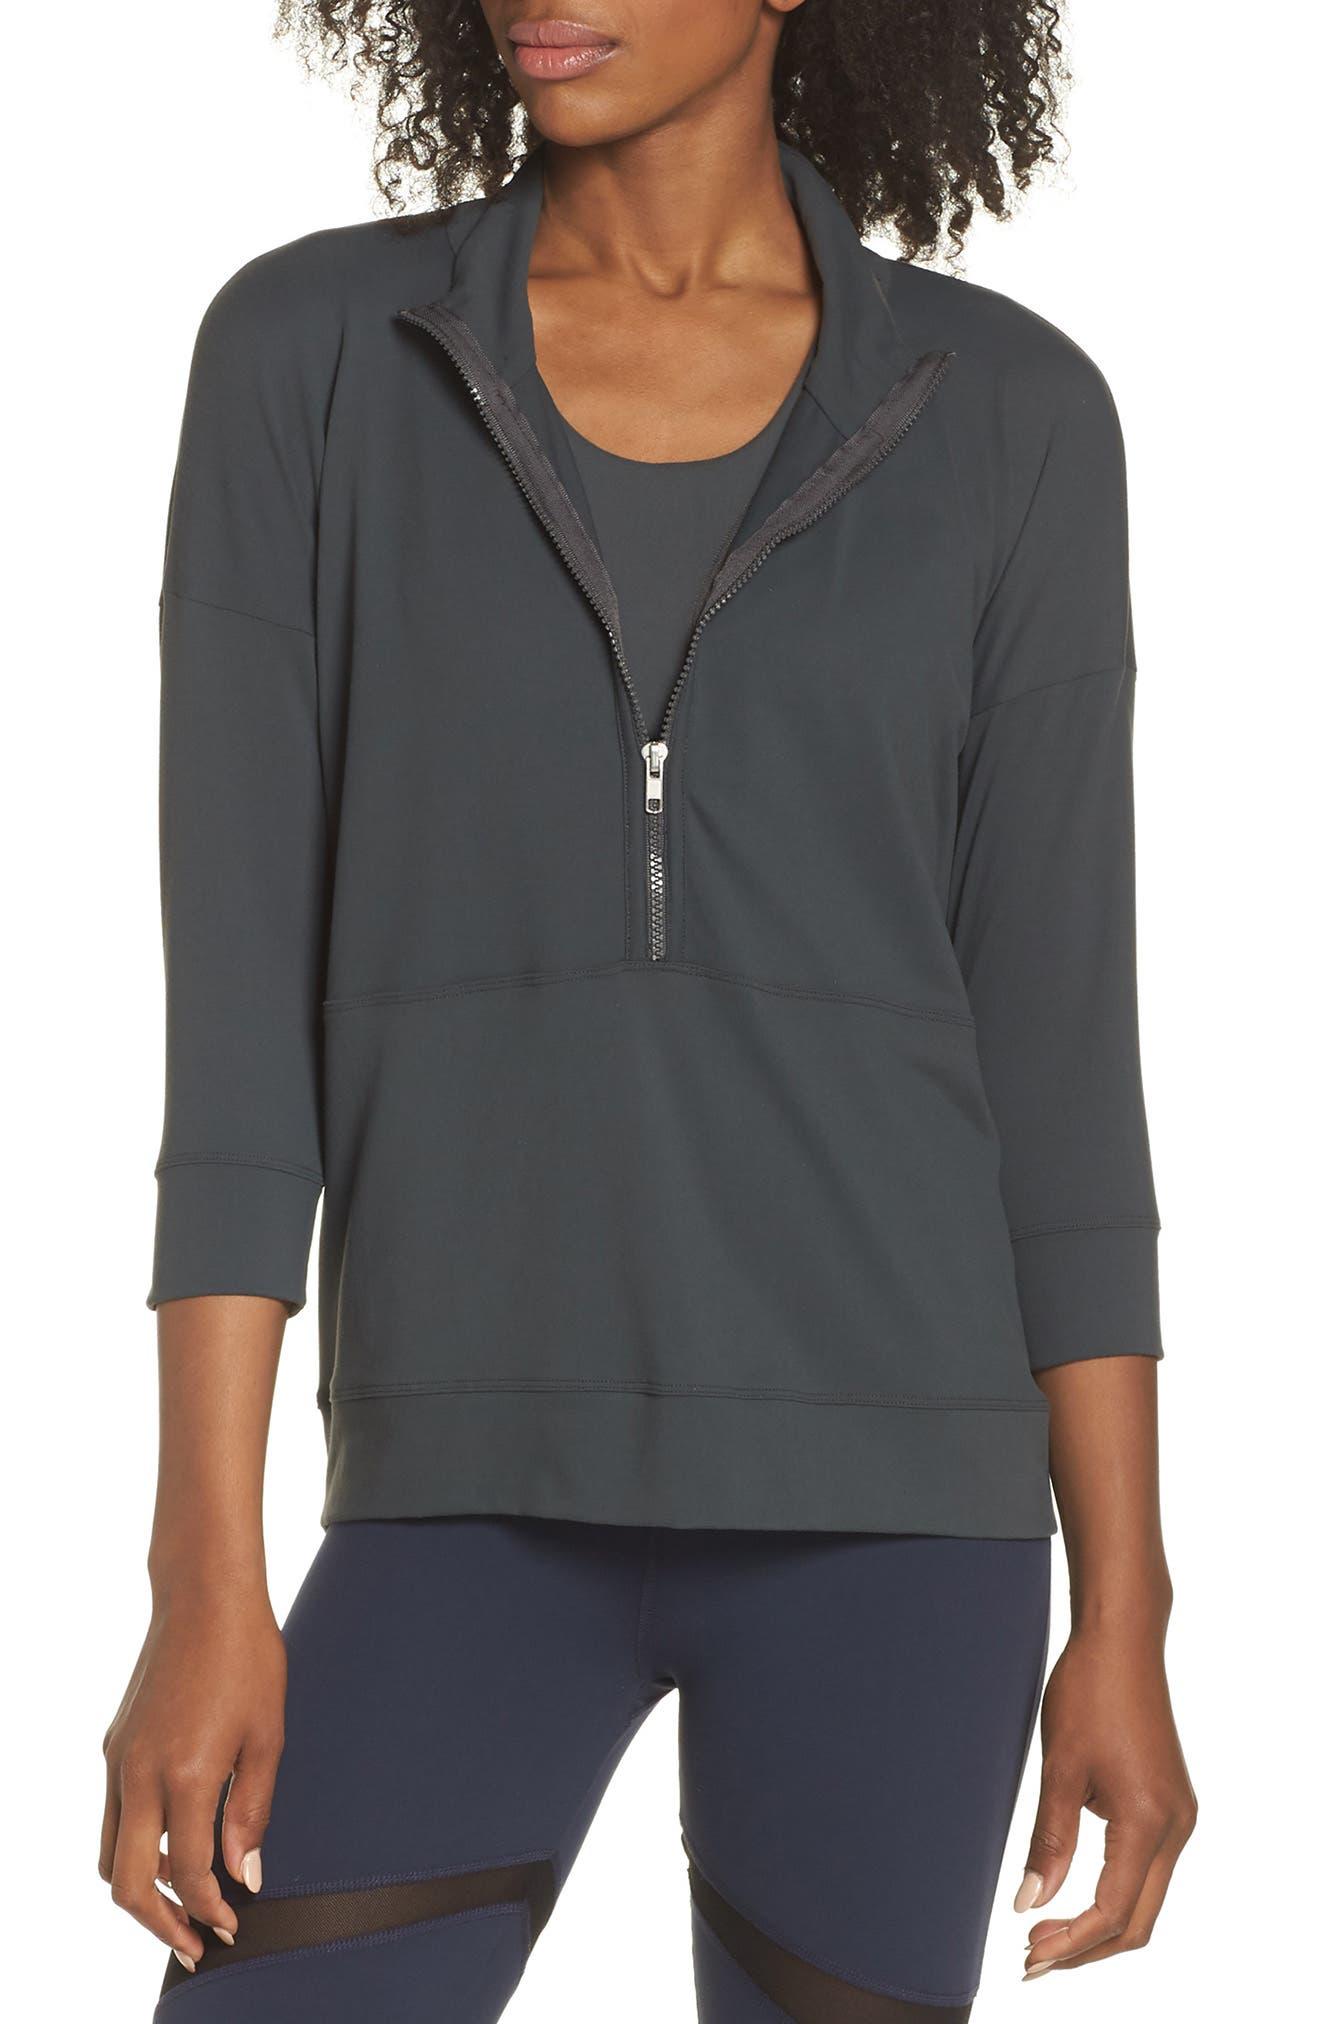 BoomBoom Athletica Novelty Eye Sweatshirt,                         Main,                         color, 020